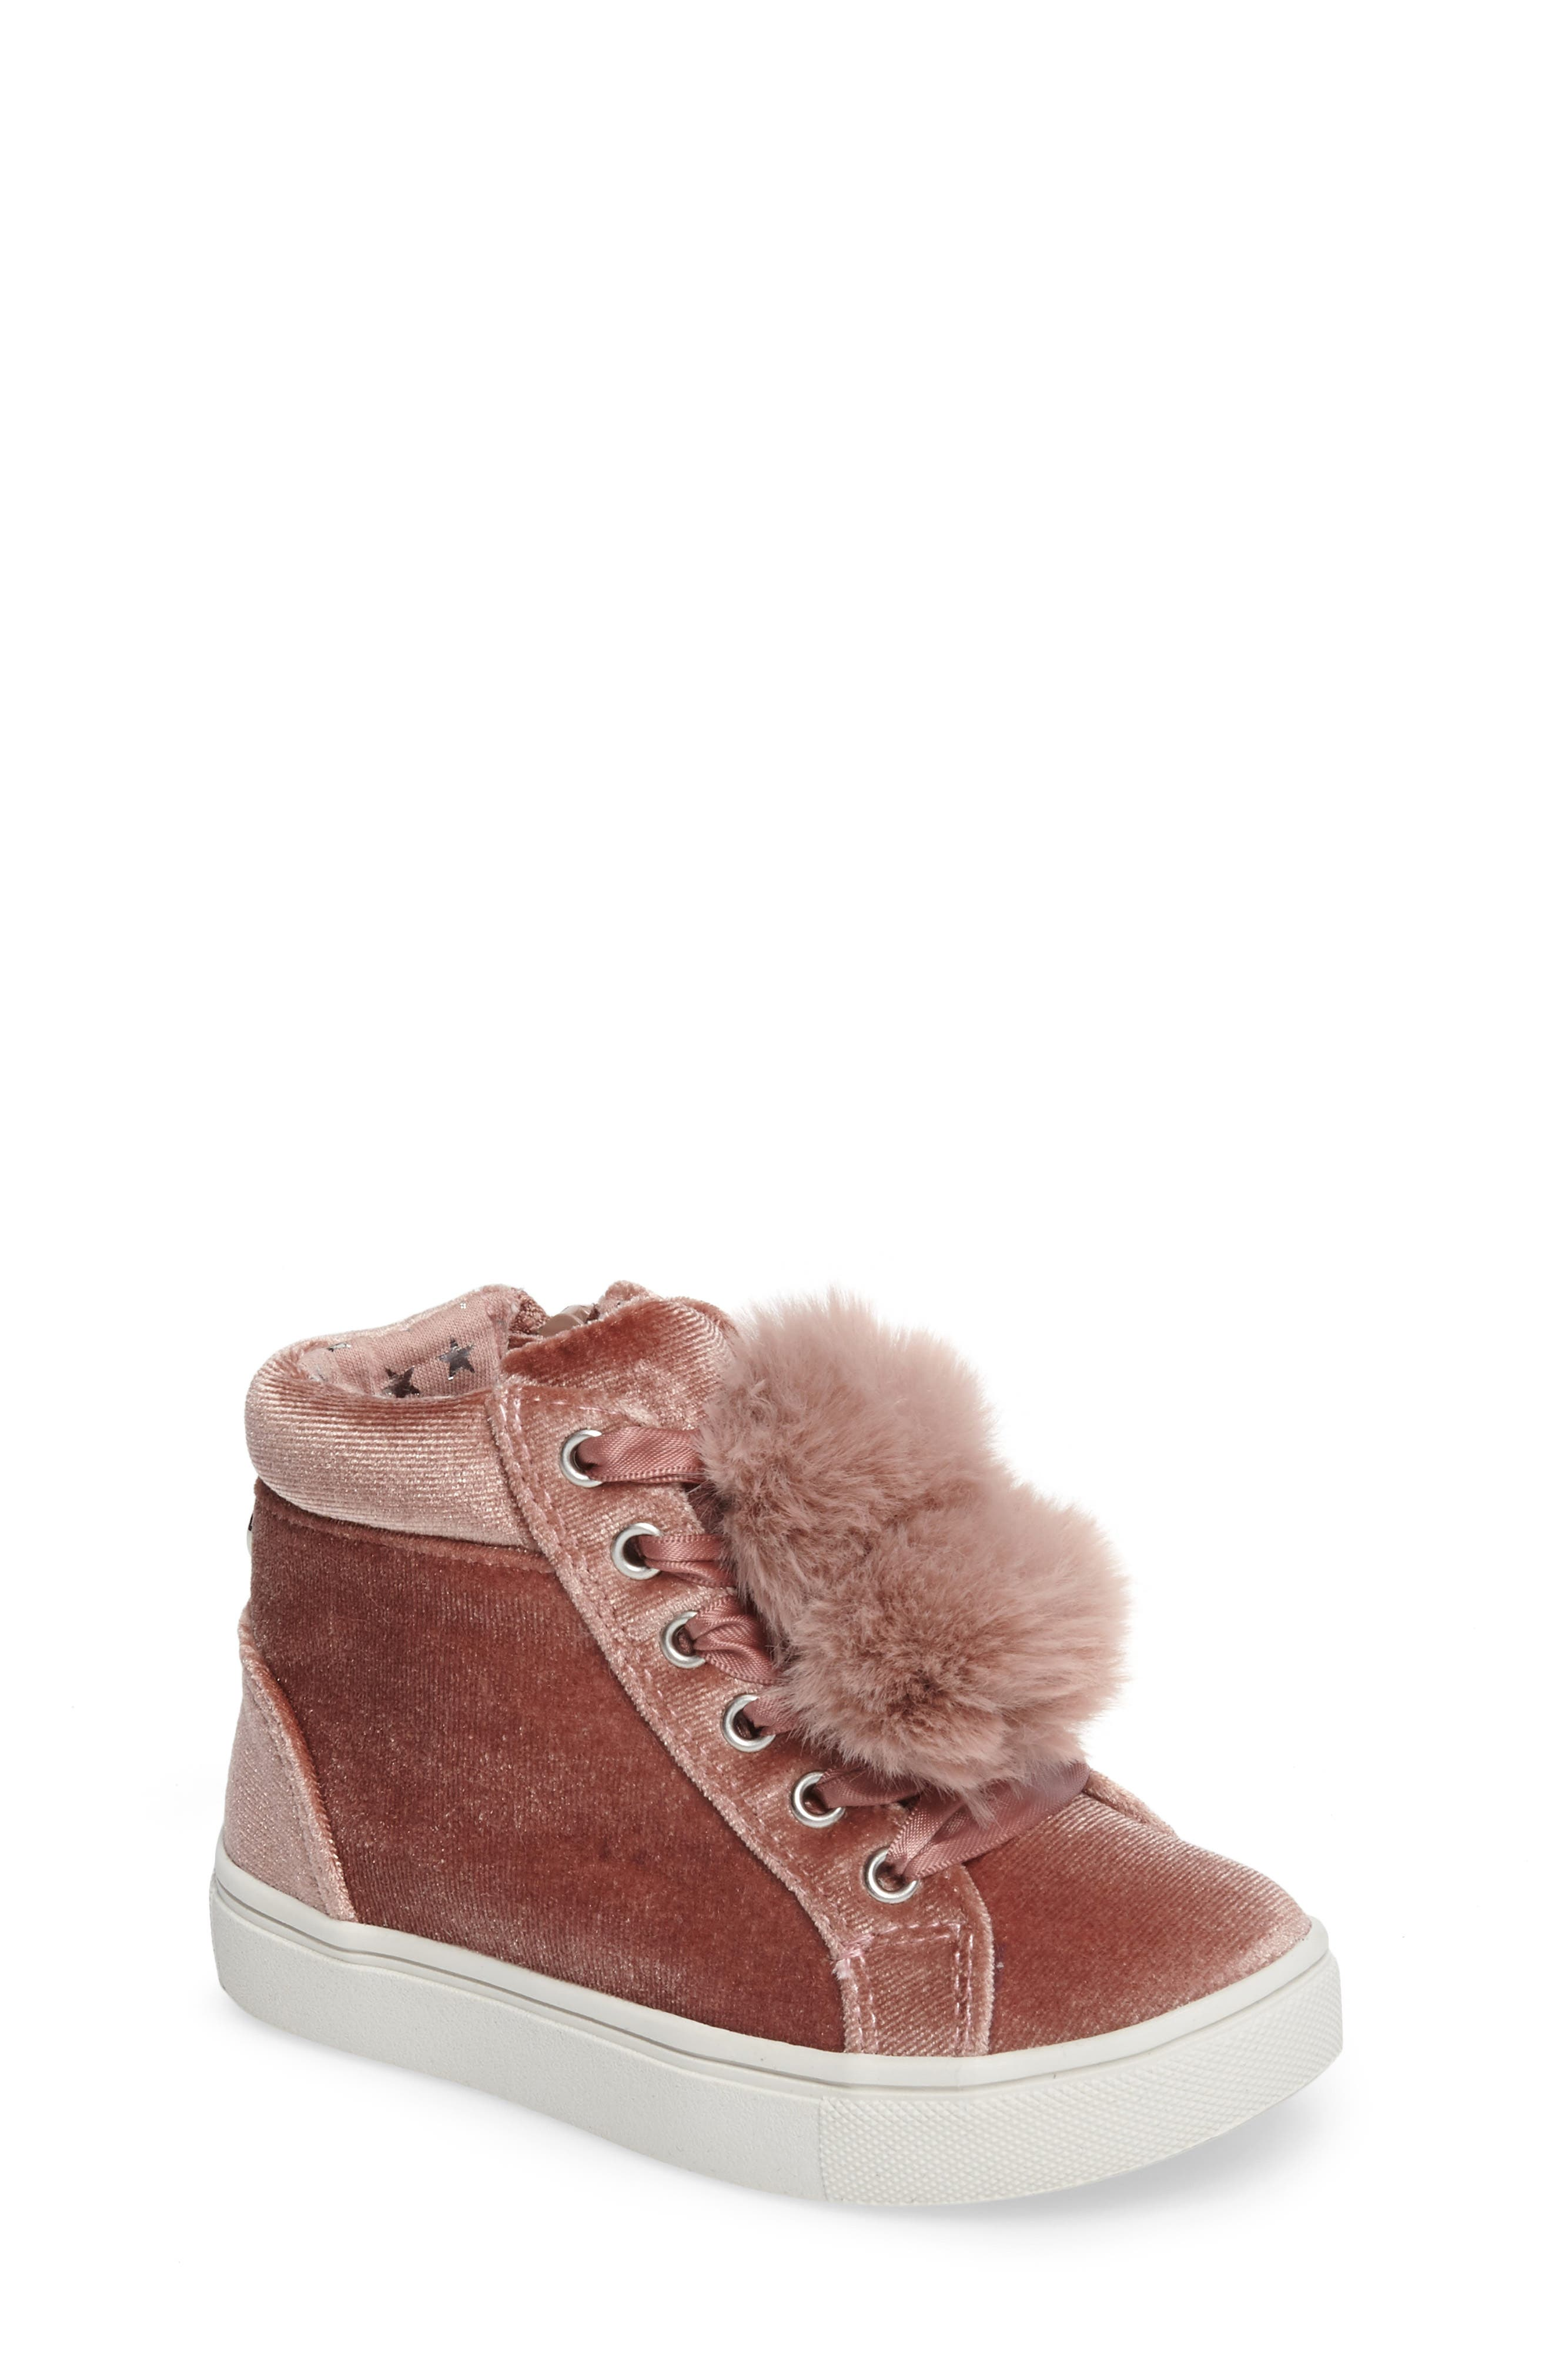 Steve Madden Brielle Faux Fur High Top Sneaker (Toddler)